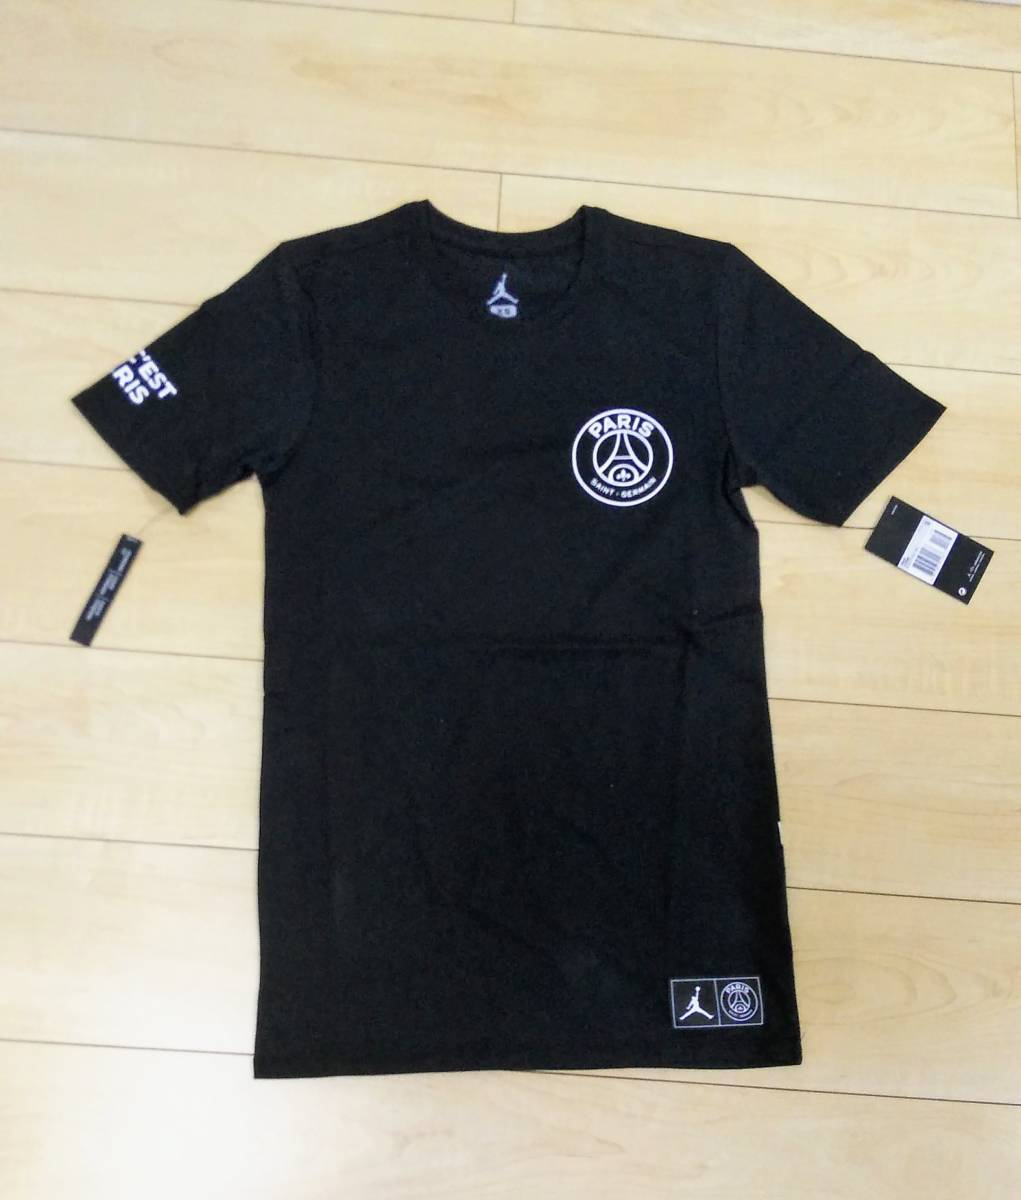 dd5fb9b63ba458 ultra rare!! NIKE Jordan PSG collaboration T-shirt XL size NIKE ...